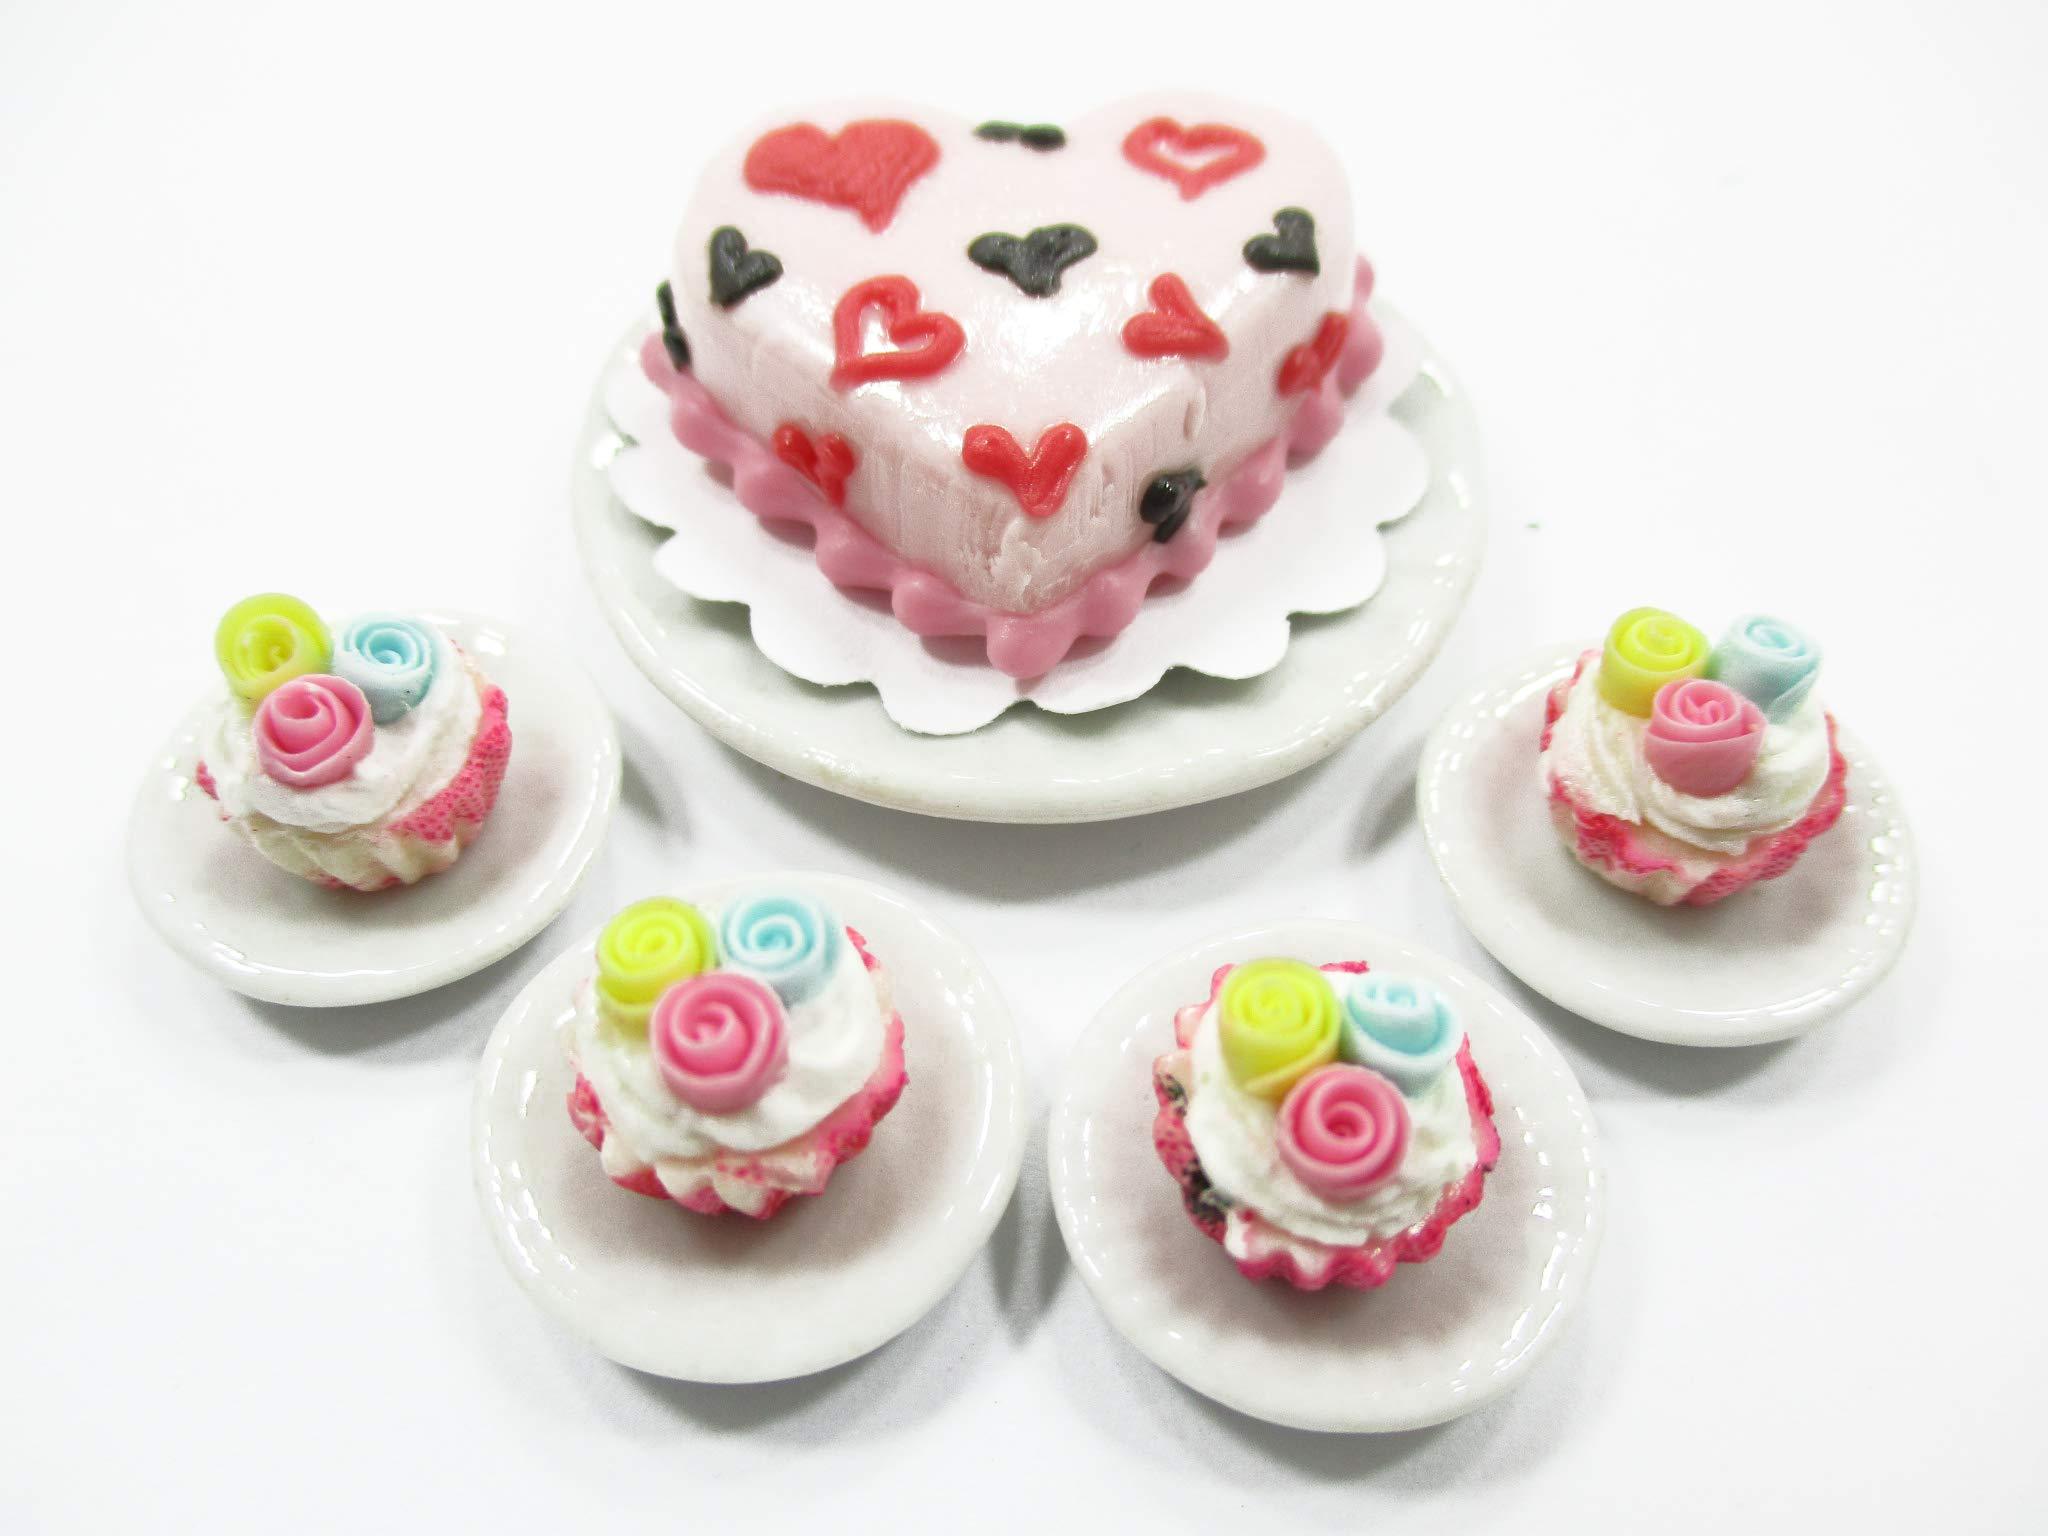 Dollhouse Miniature Food Christmas 1.5 cm Mini Cake Cupcake Ceramic Plate 15503